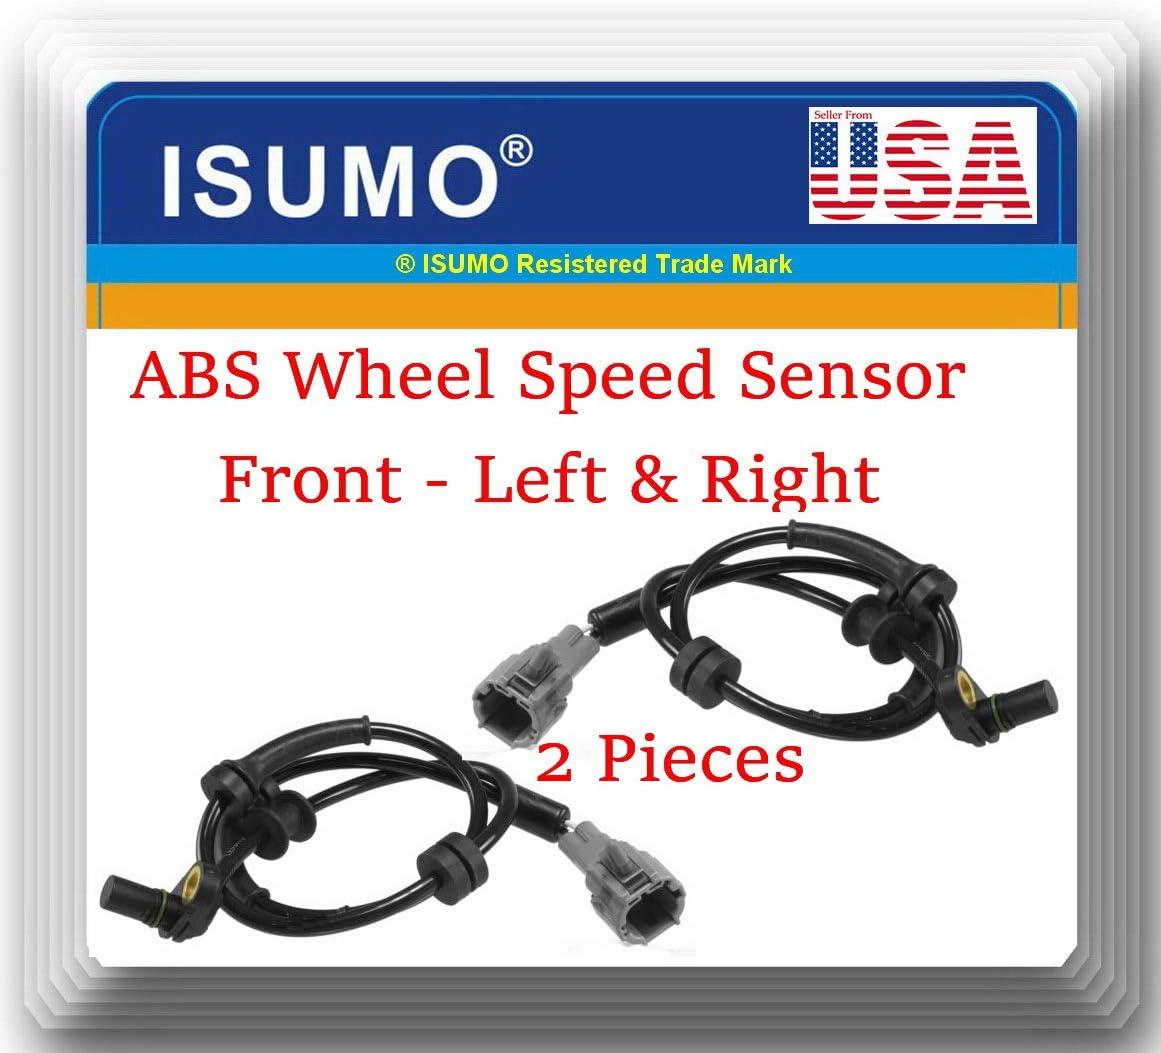 Nissan Armada 2008-2012 Nissan Titan 2008-2011 2 Pieces ABS Wheel Speed Sensor Front Left /& Right Fits Infiniti QX56 2008-2010